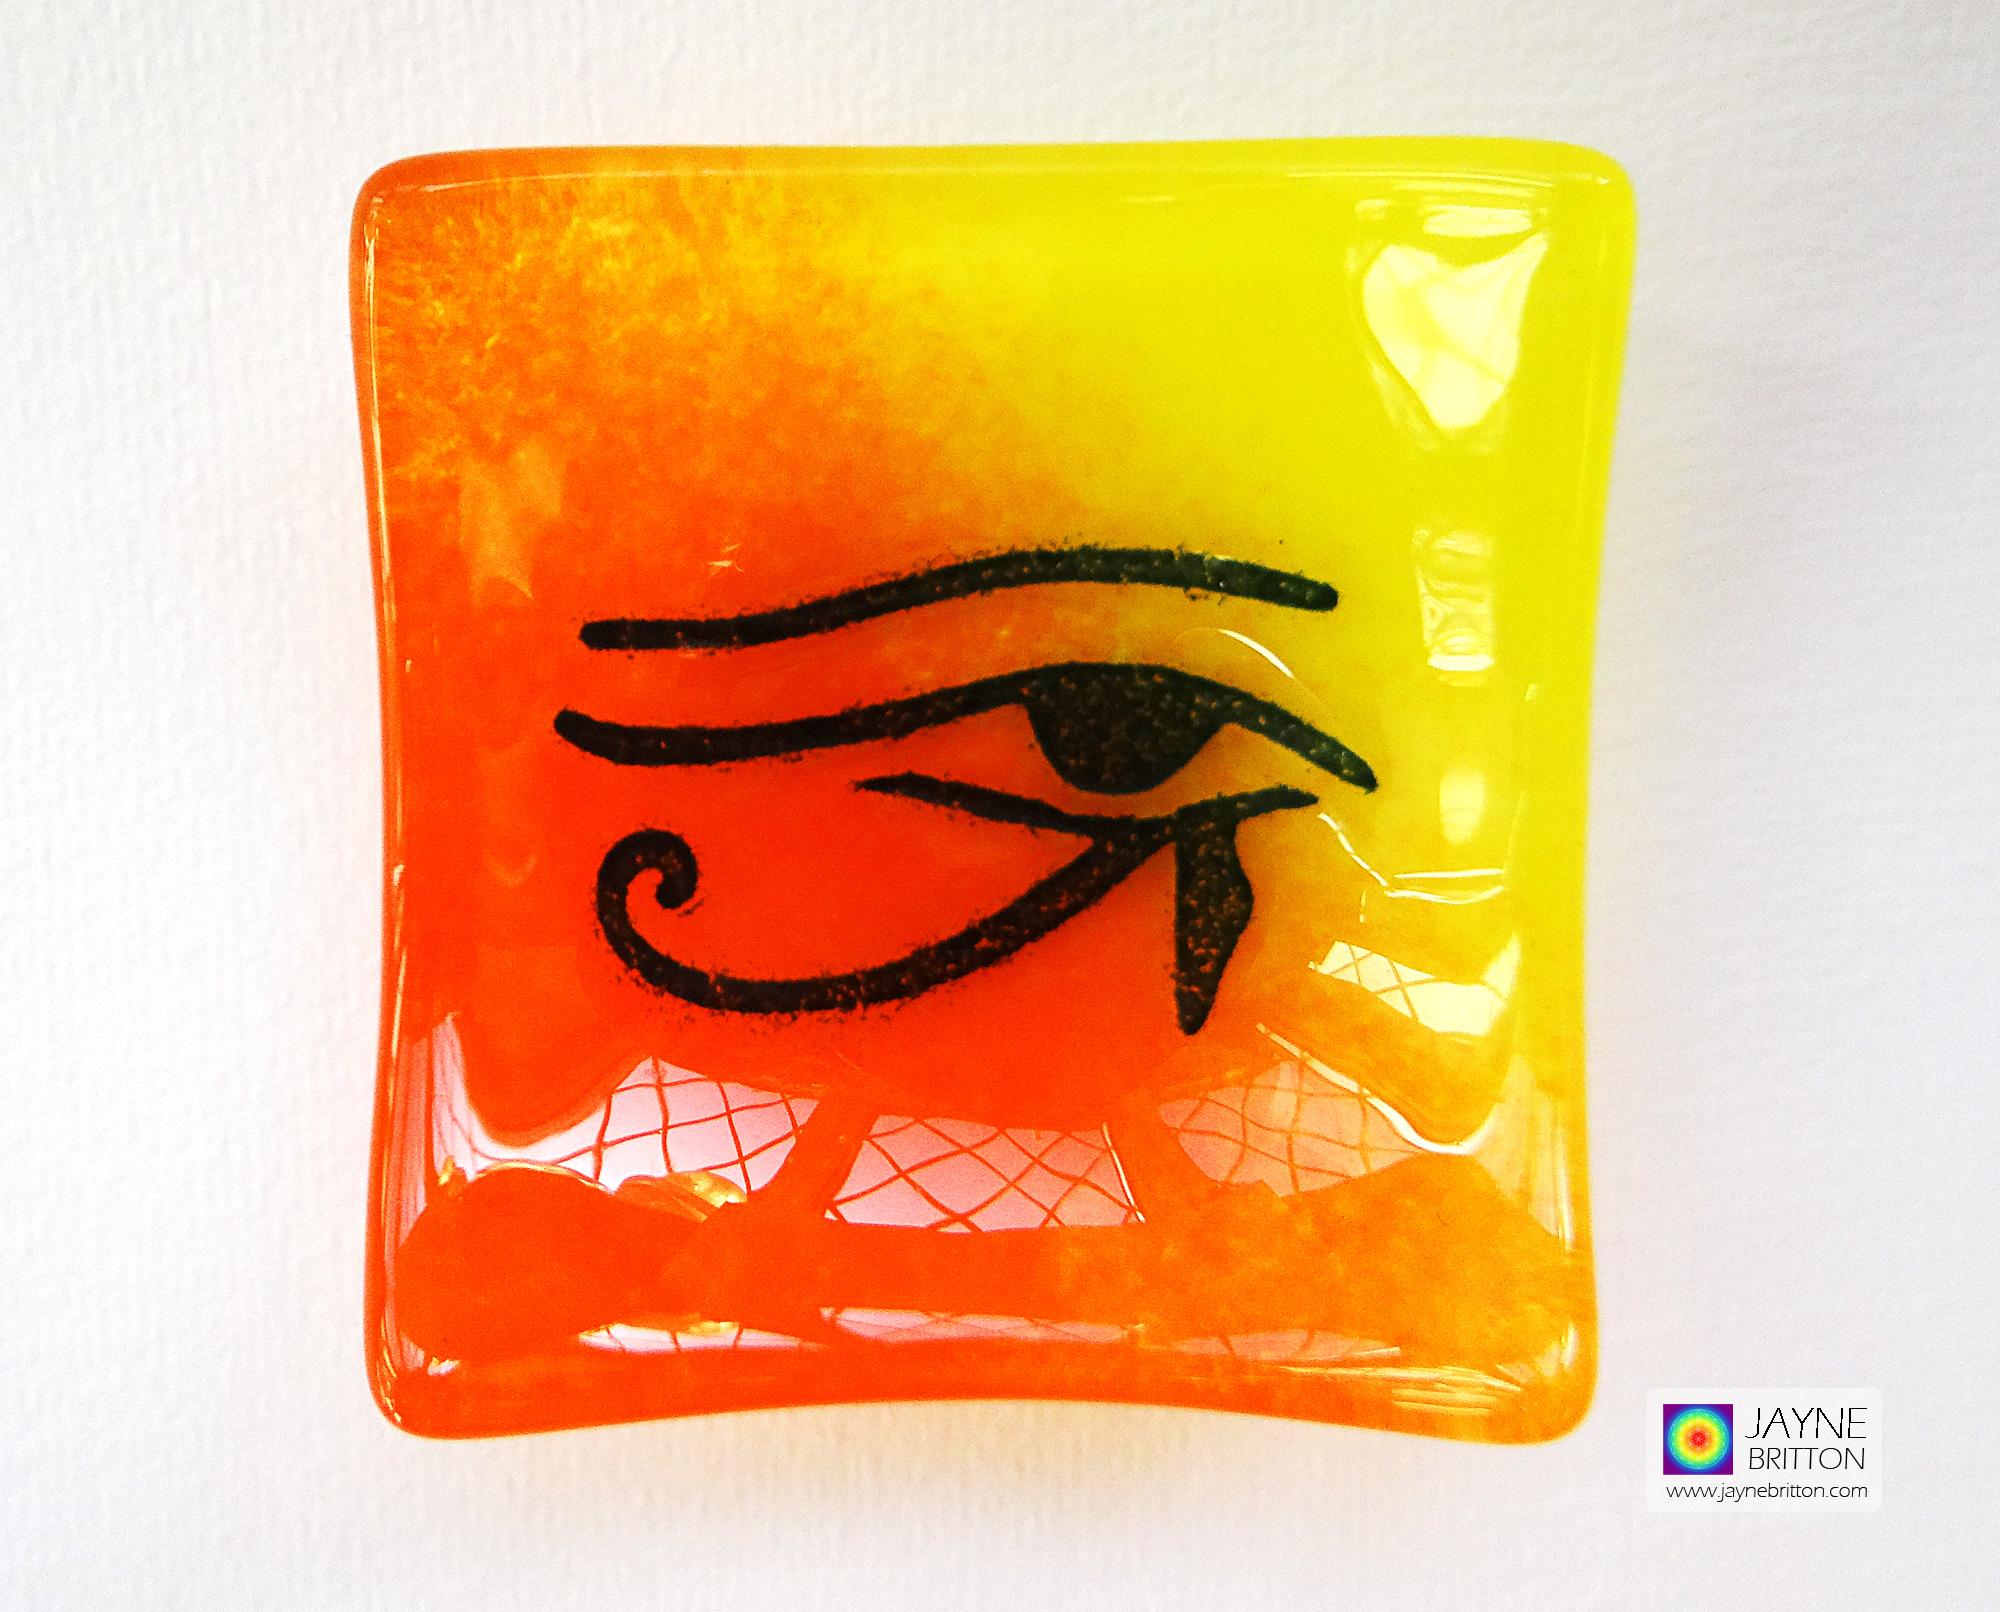 Eye of Horus bowl in yellow orange blended fused glass